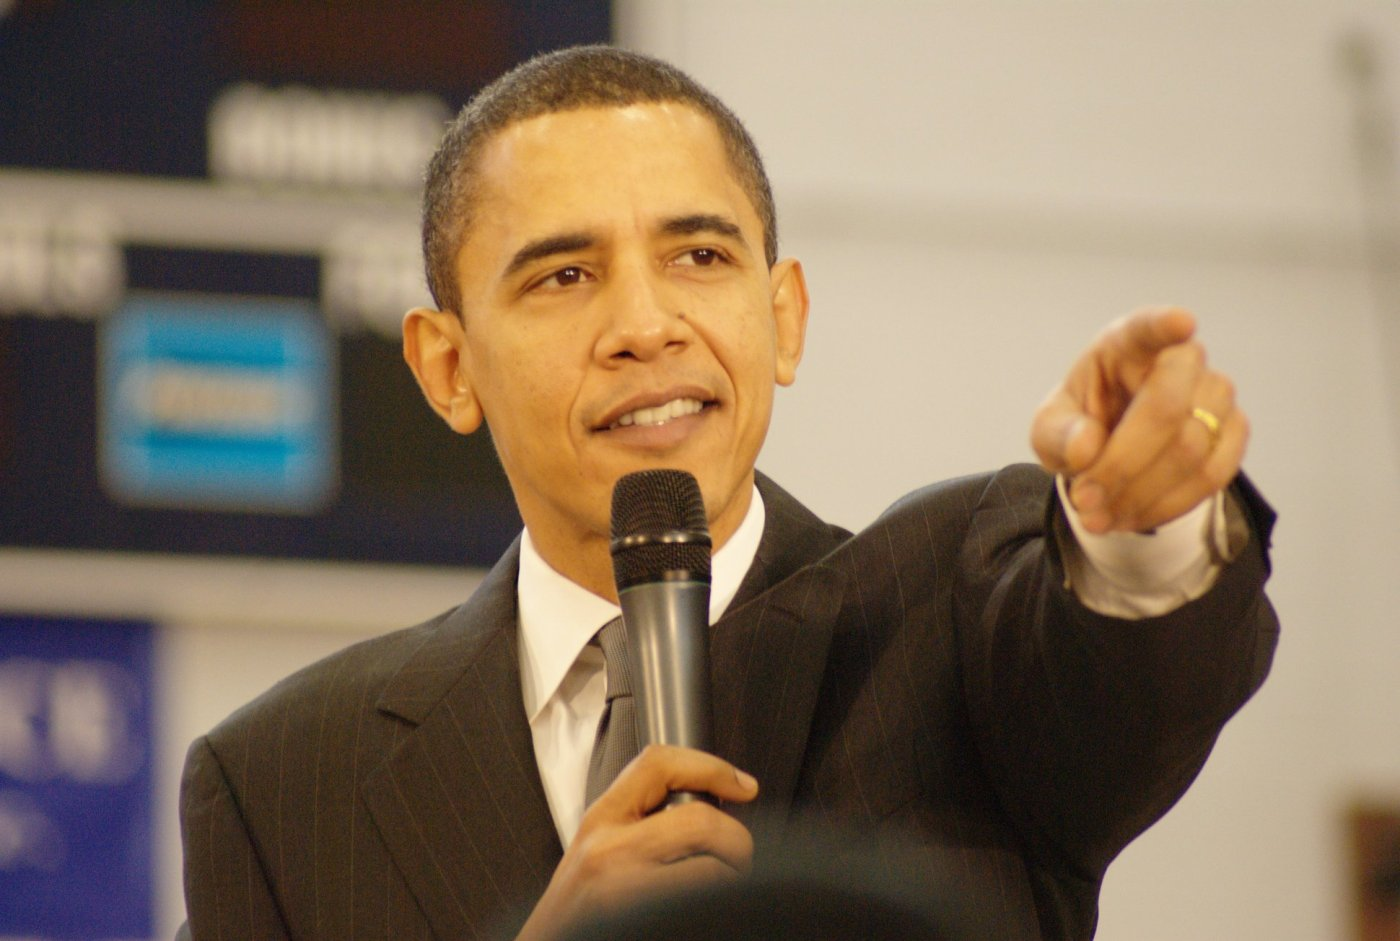 Barak Obama on the microphone